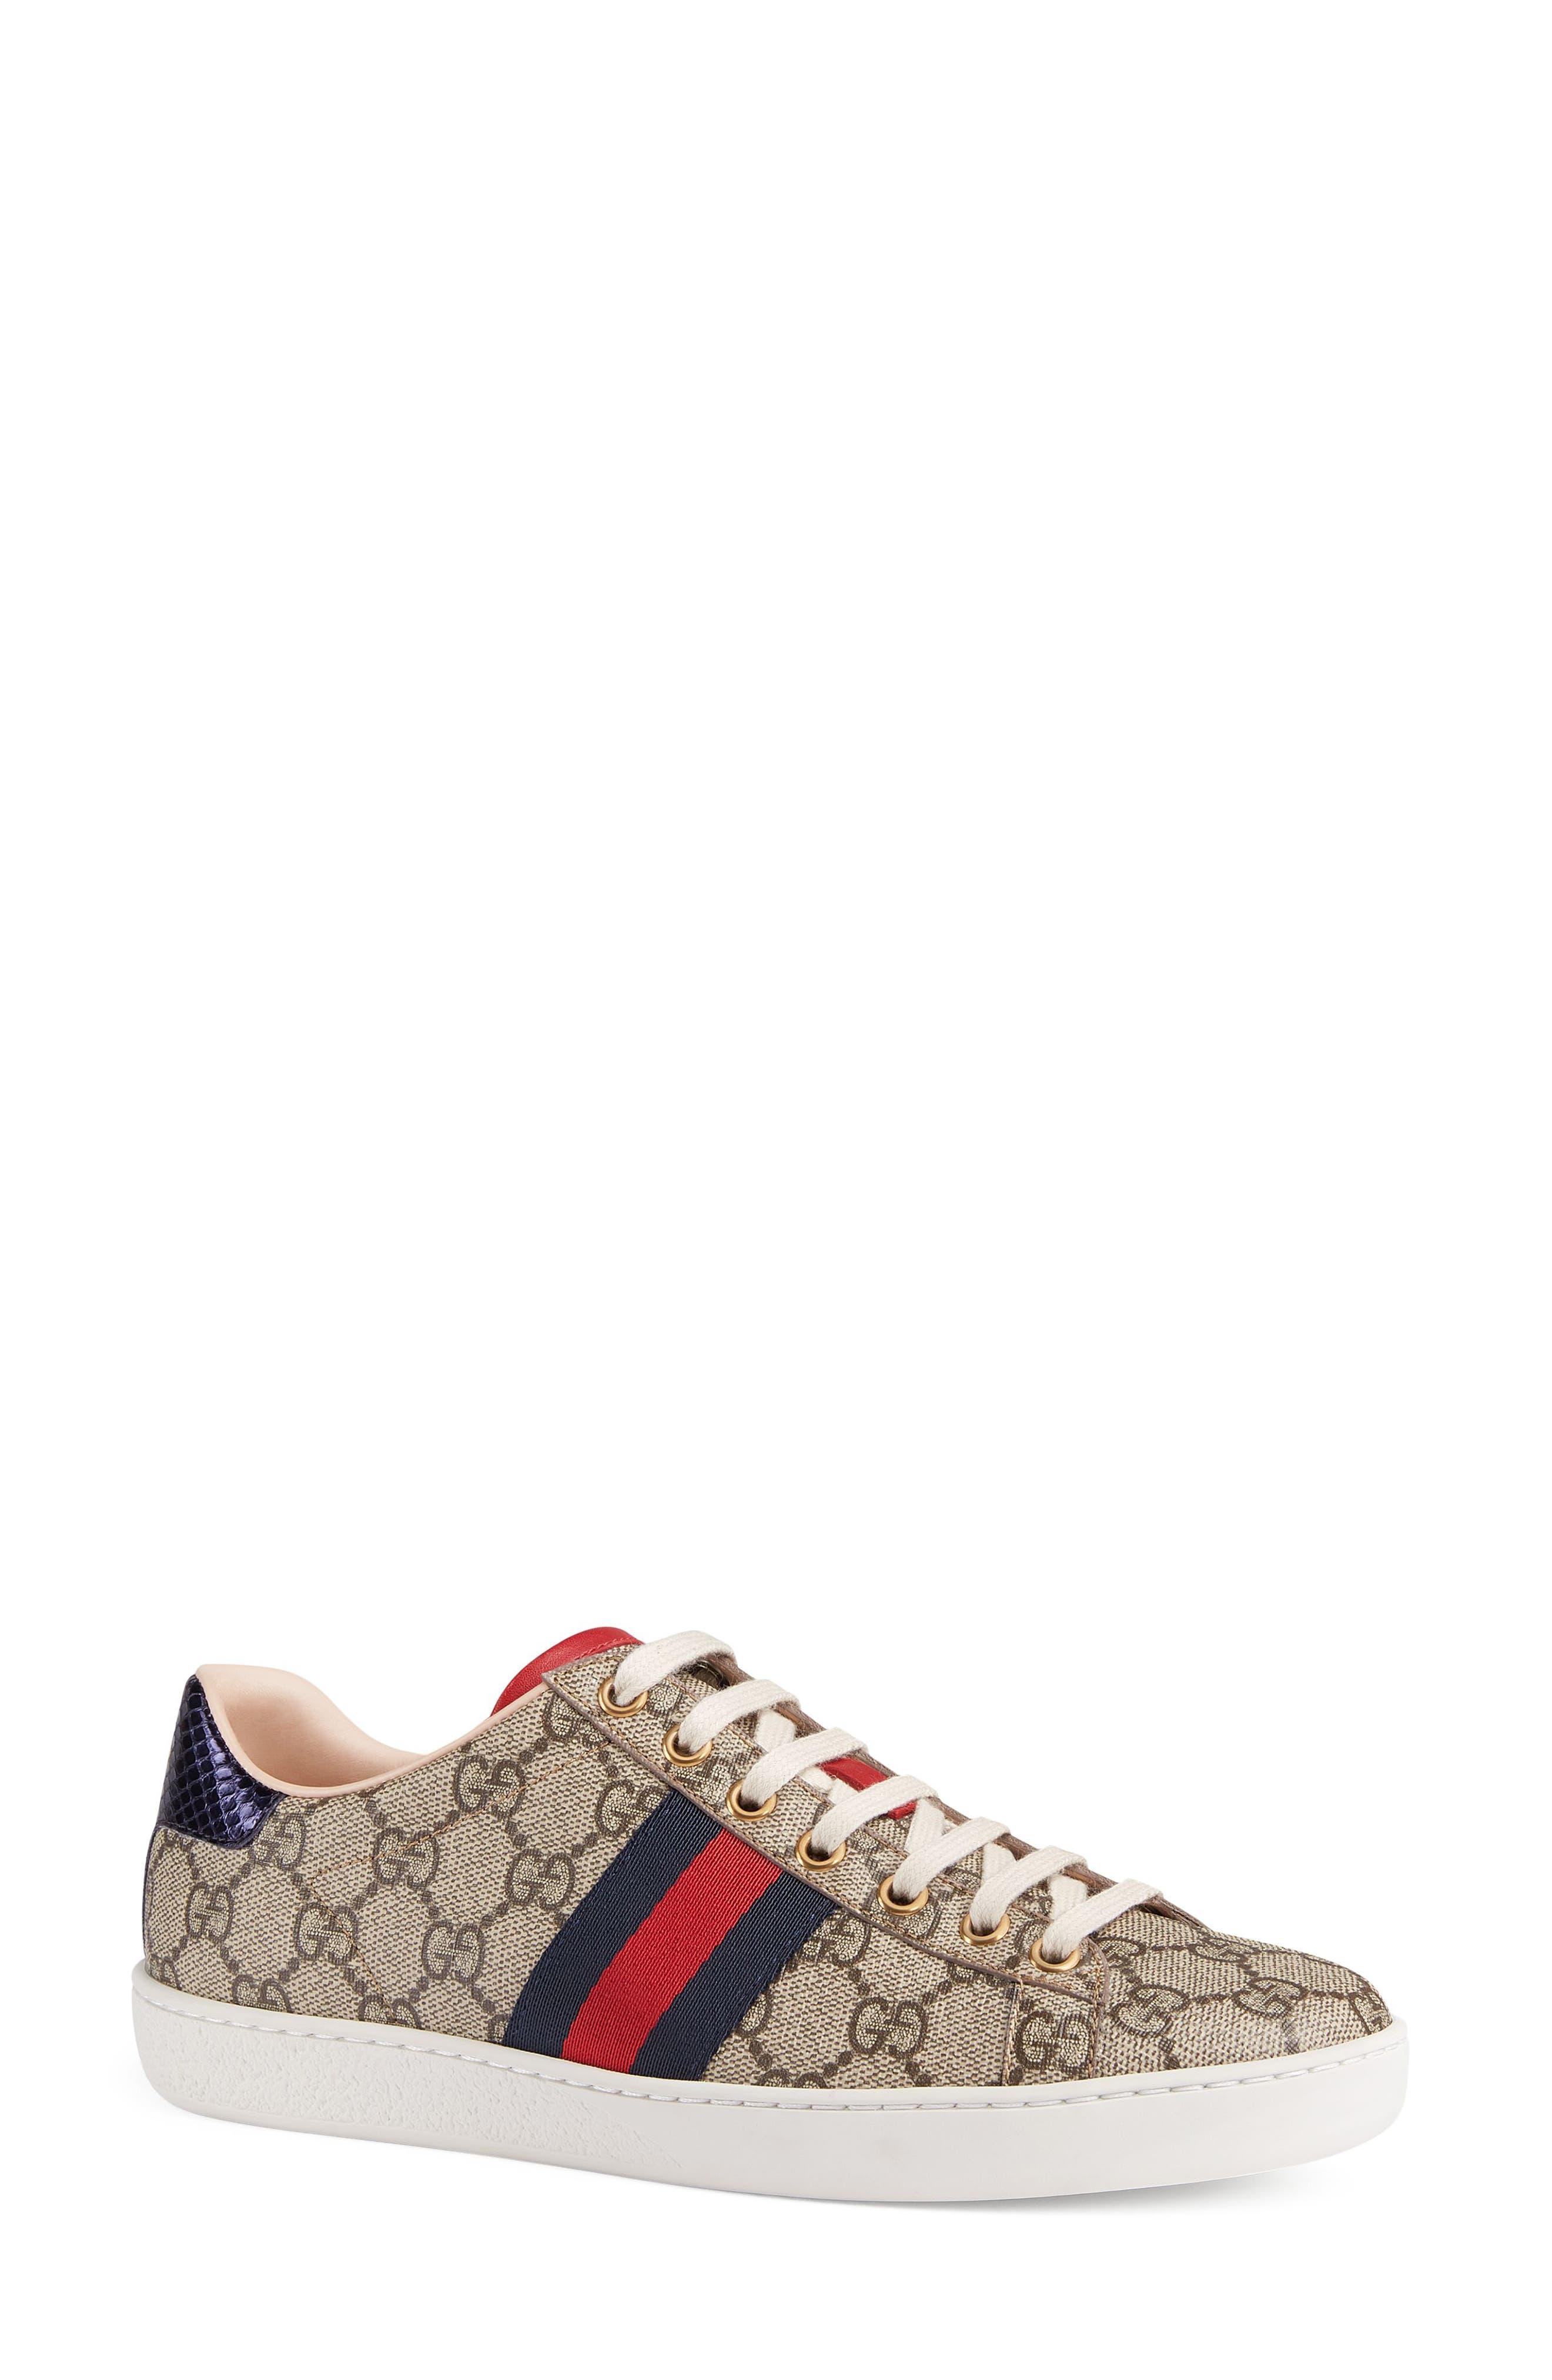 New Ace GG Supreme Sneaker,                         Main,                         color, Beige